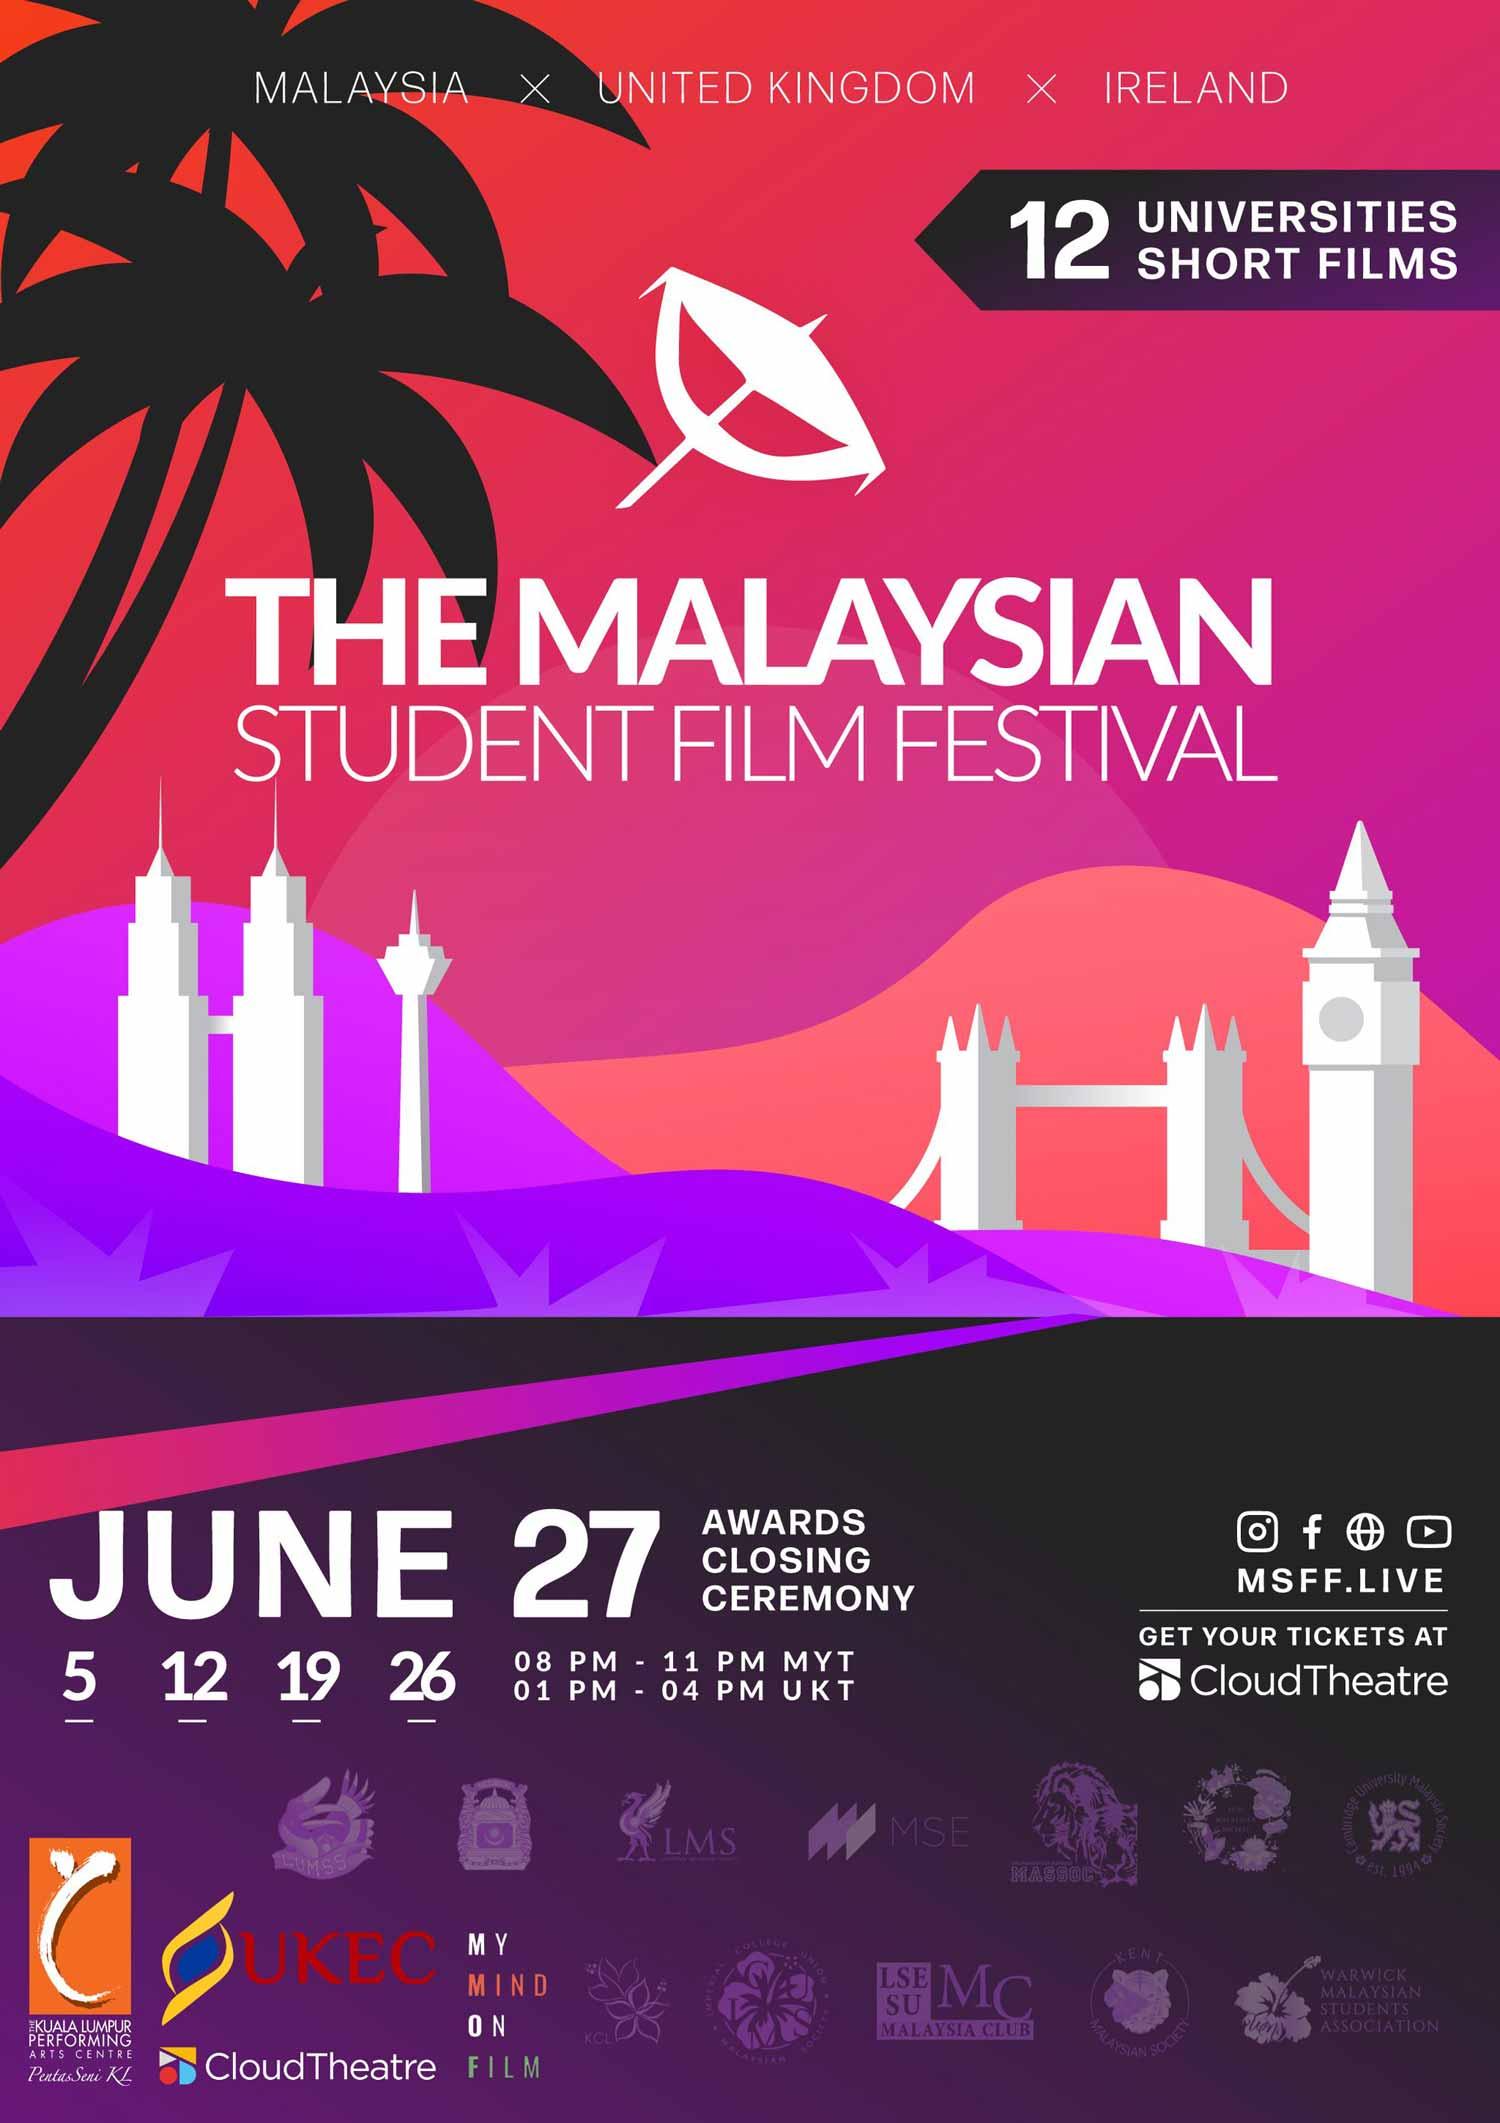 Awards Closing Ceremony: Malaysian Student Film Festival